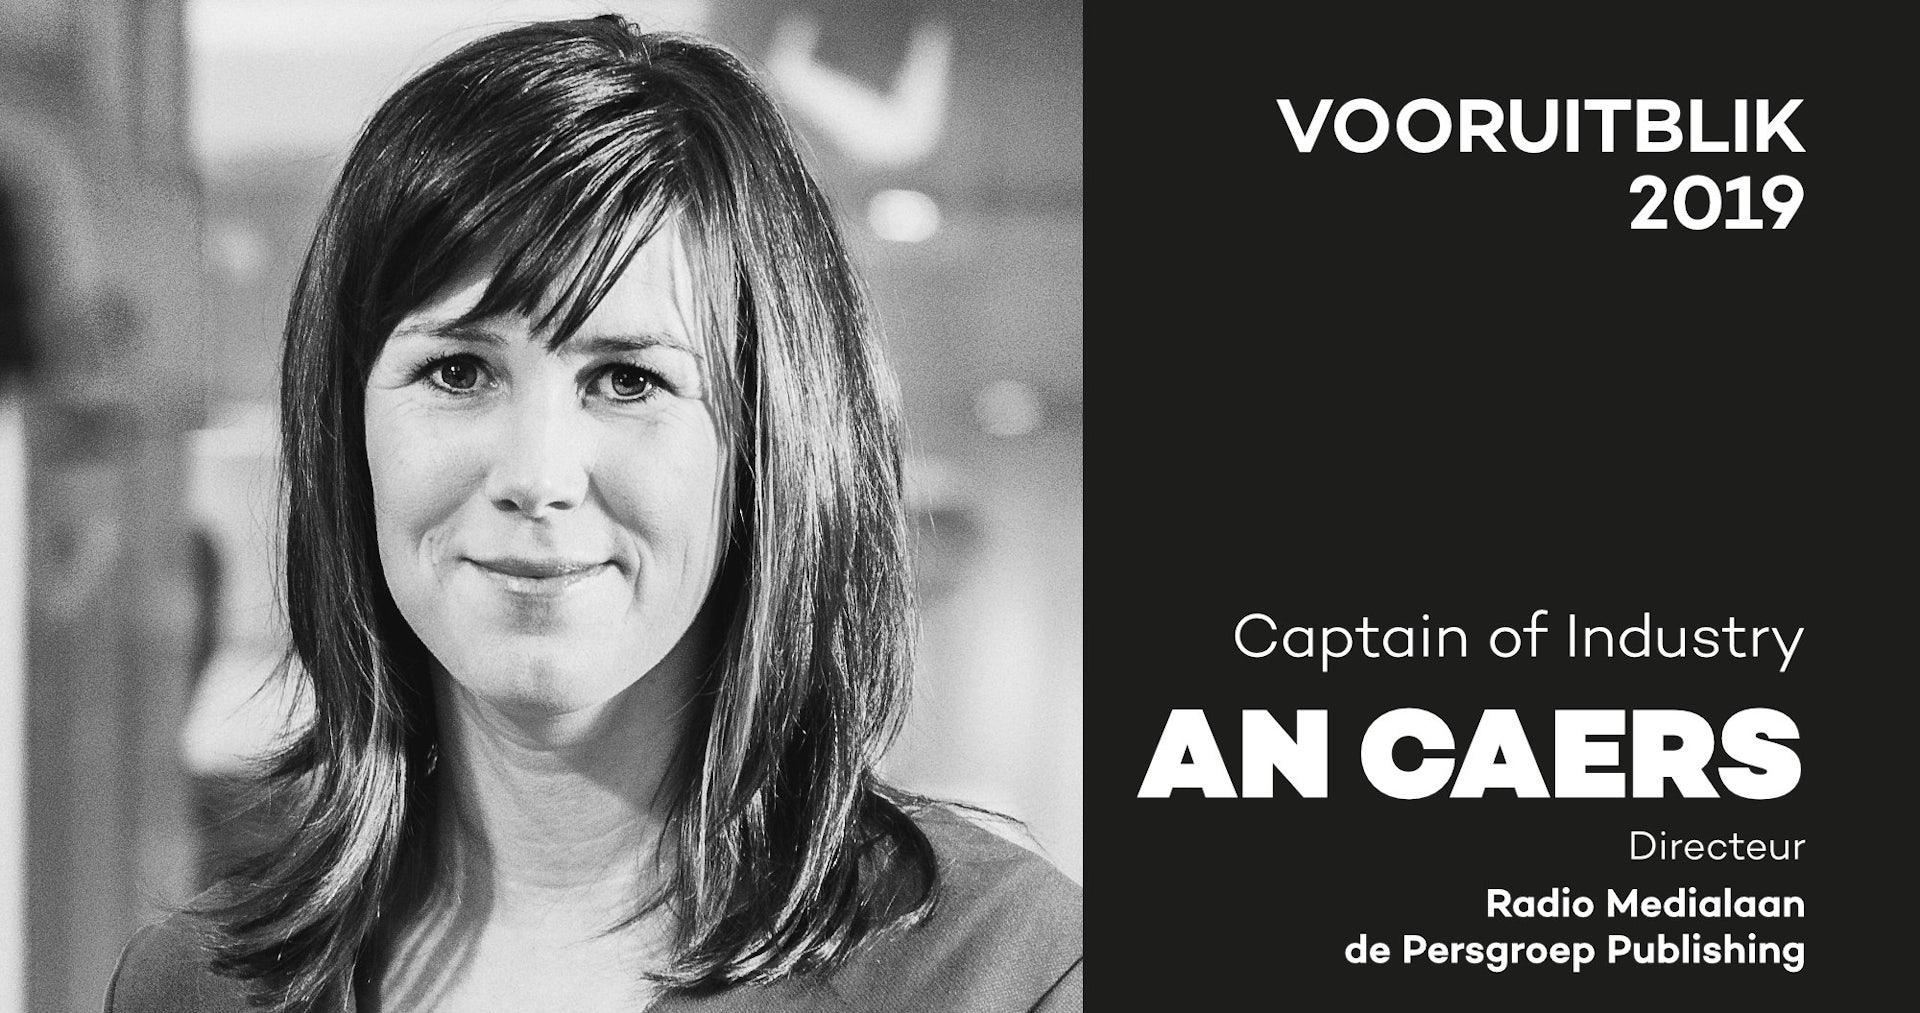 Ann Caers - Medialaan